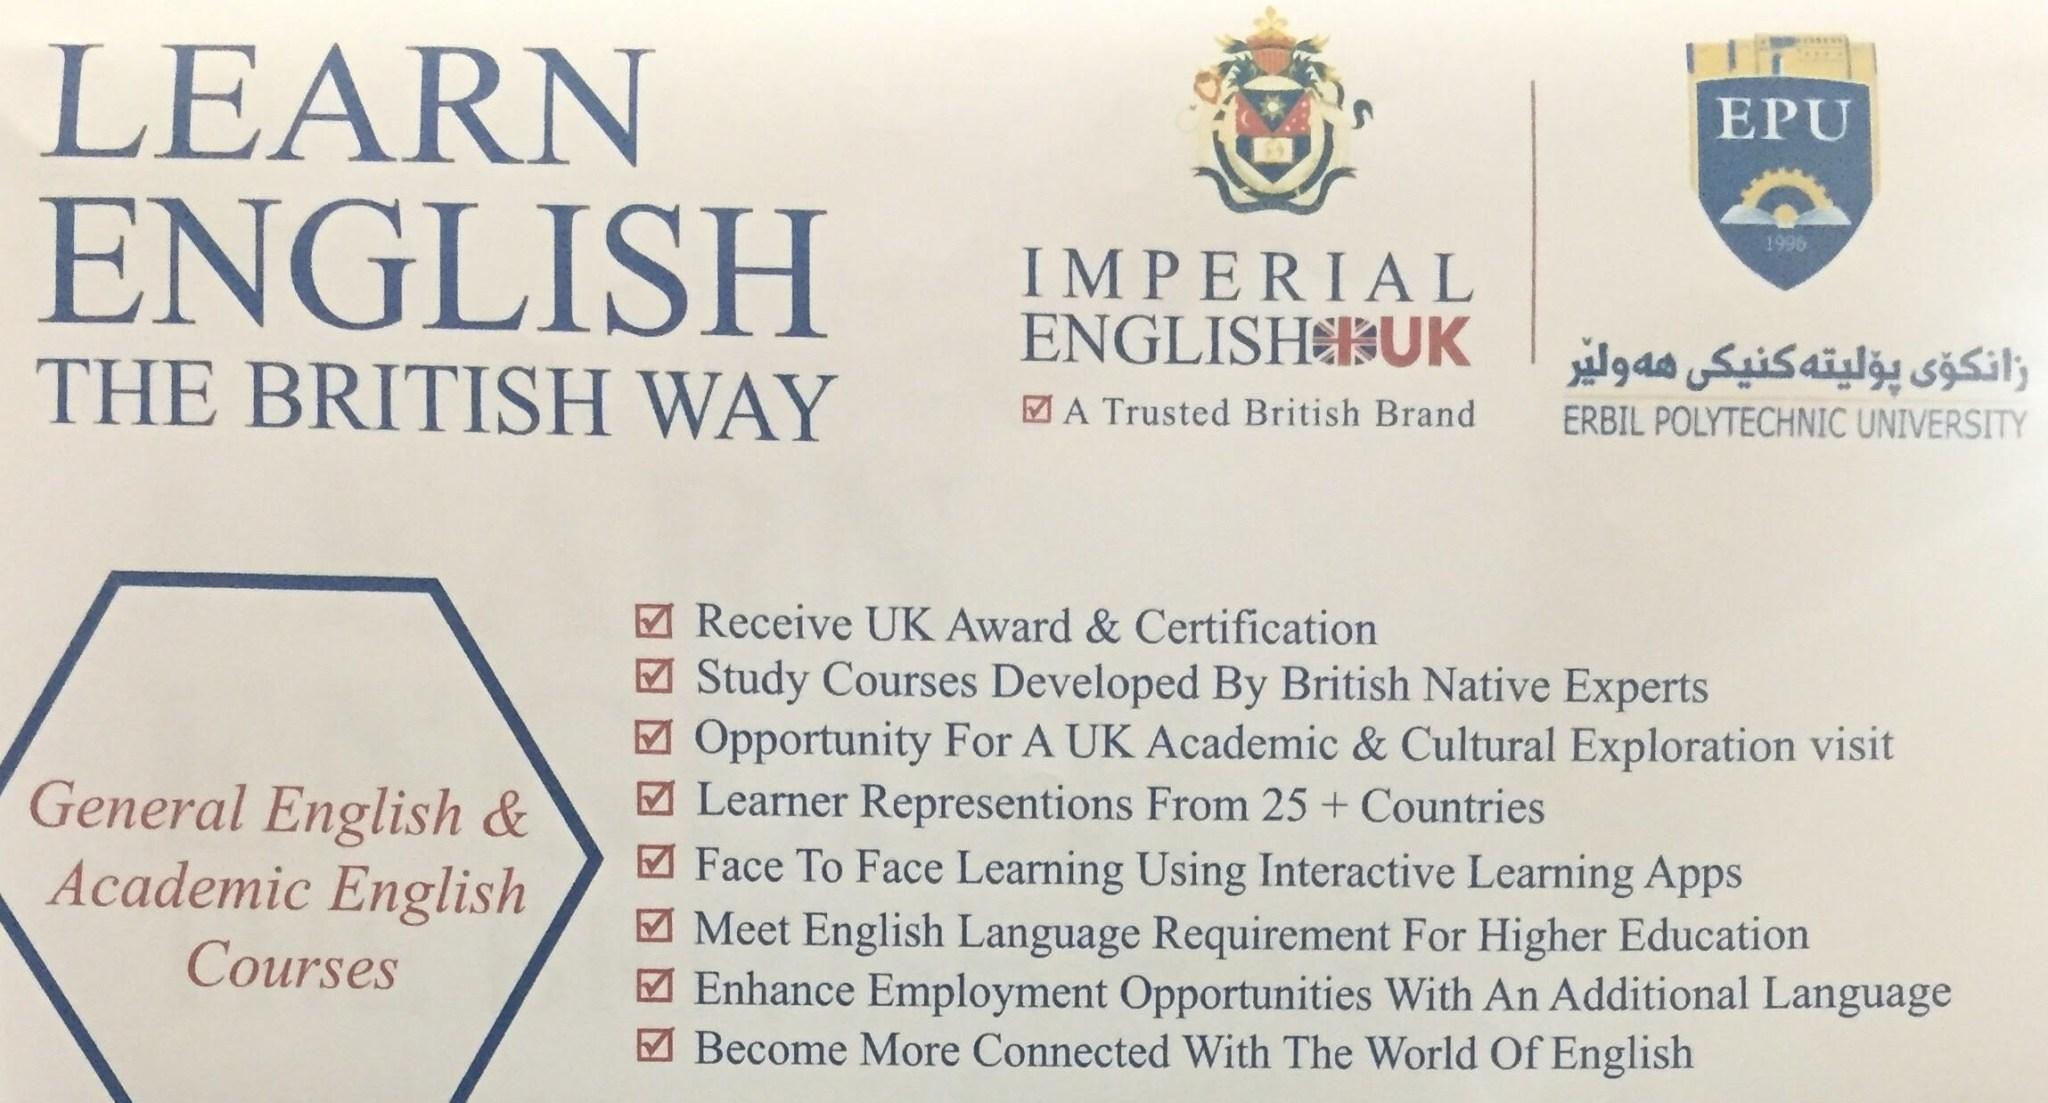 Erbil Polytechnic University Delivers An International Standard English Language Courses